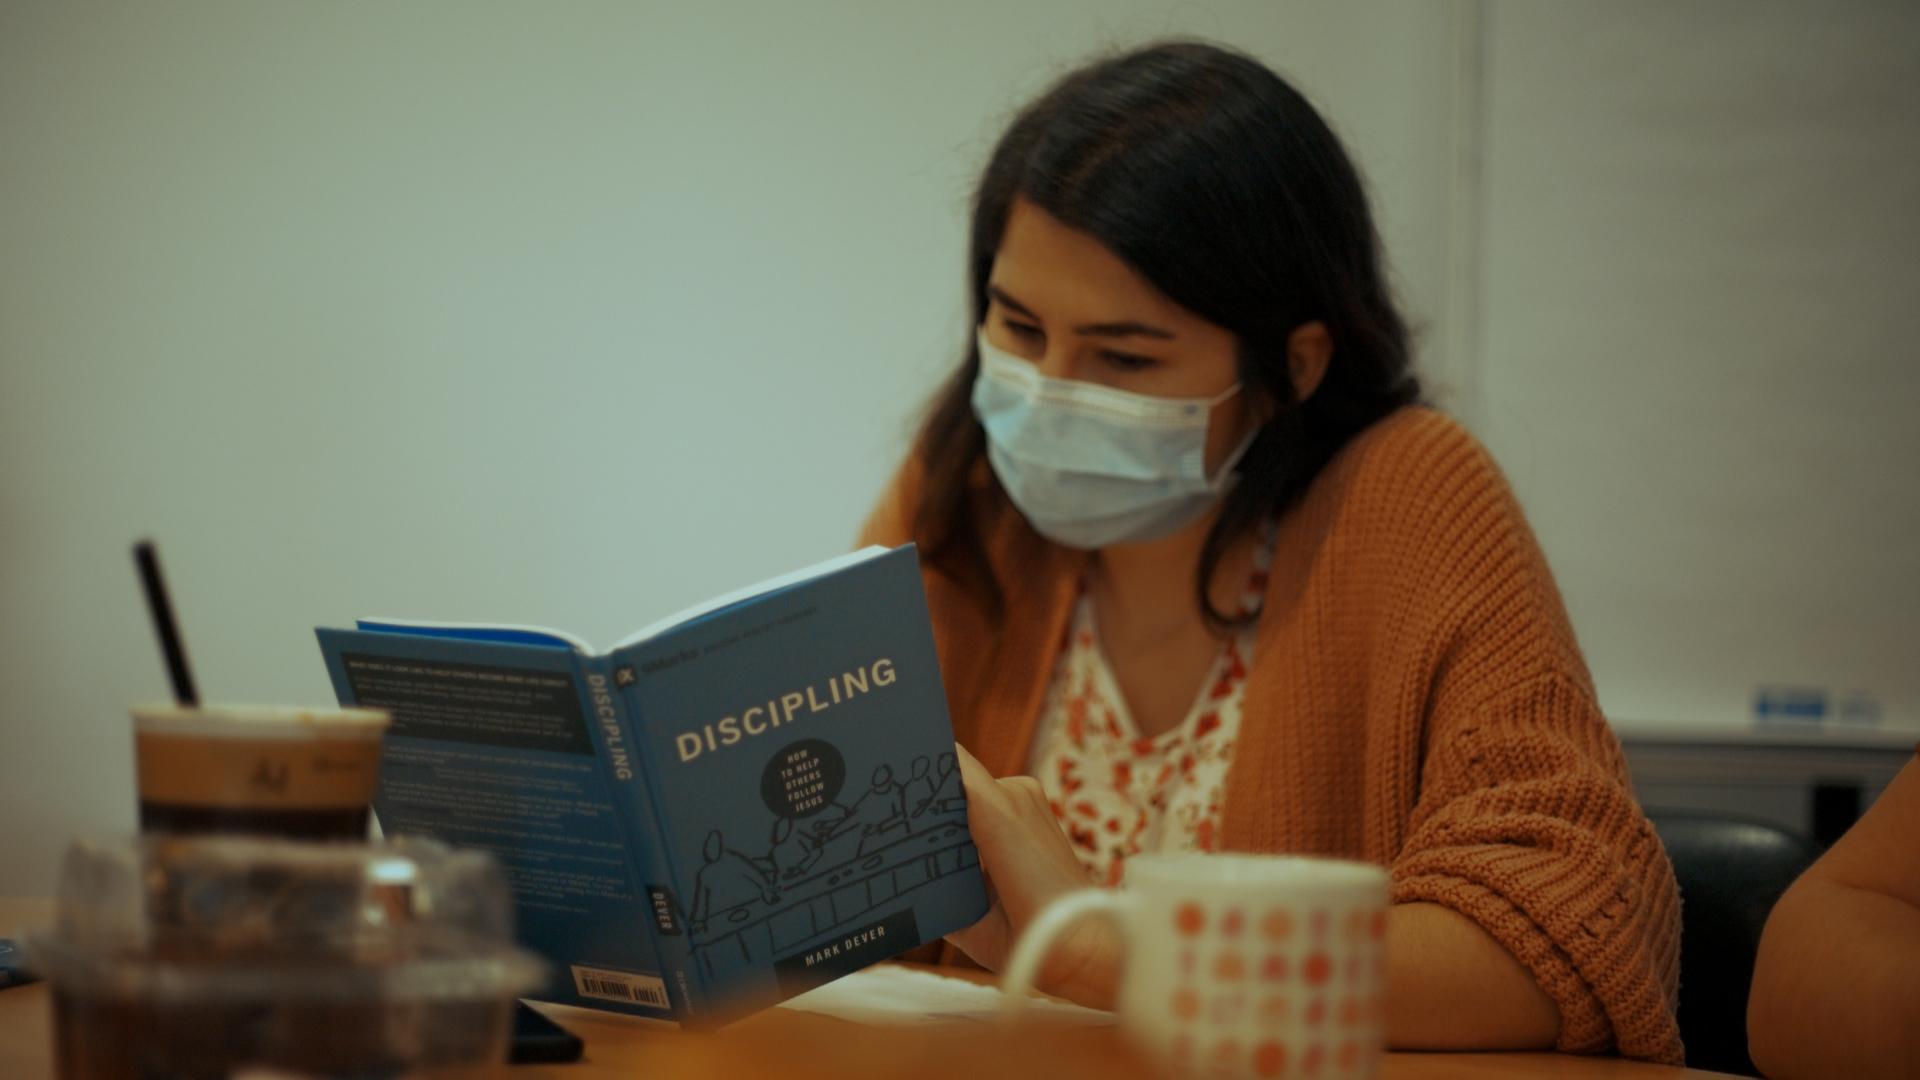 Alexandra studying